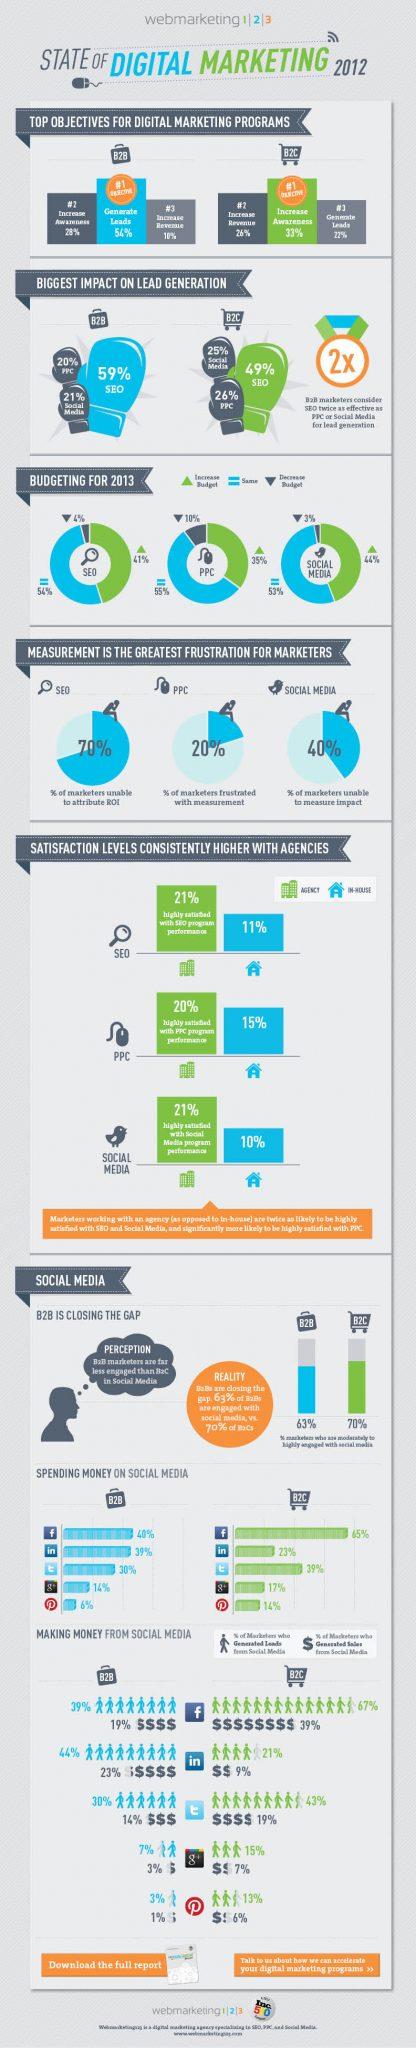 Digital Marketing 2012: Shopping, Mobile, Leads